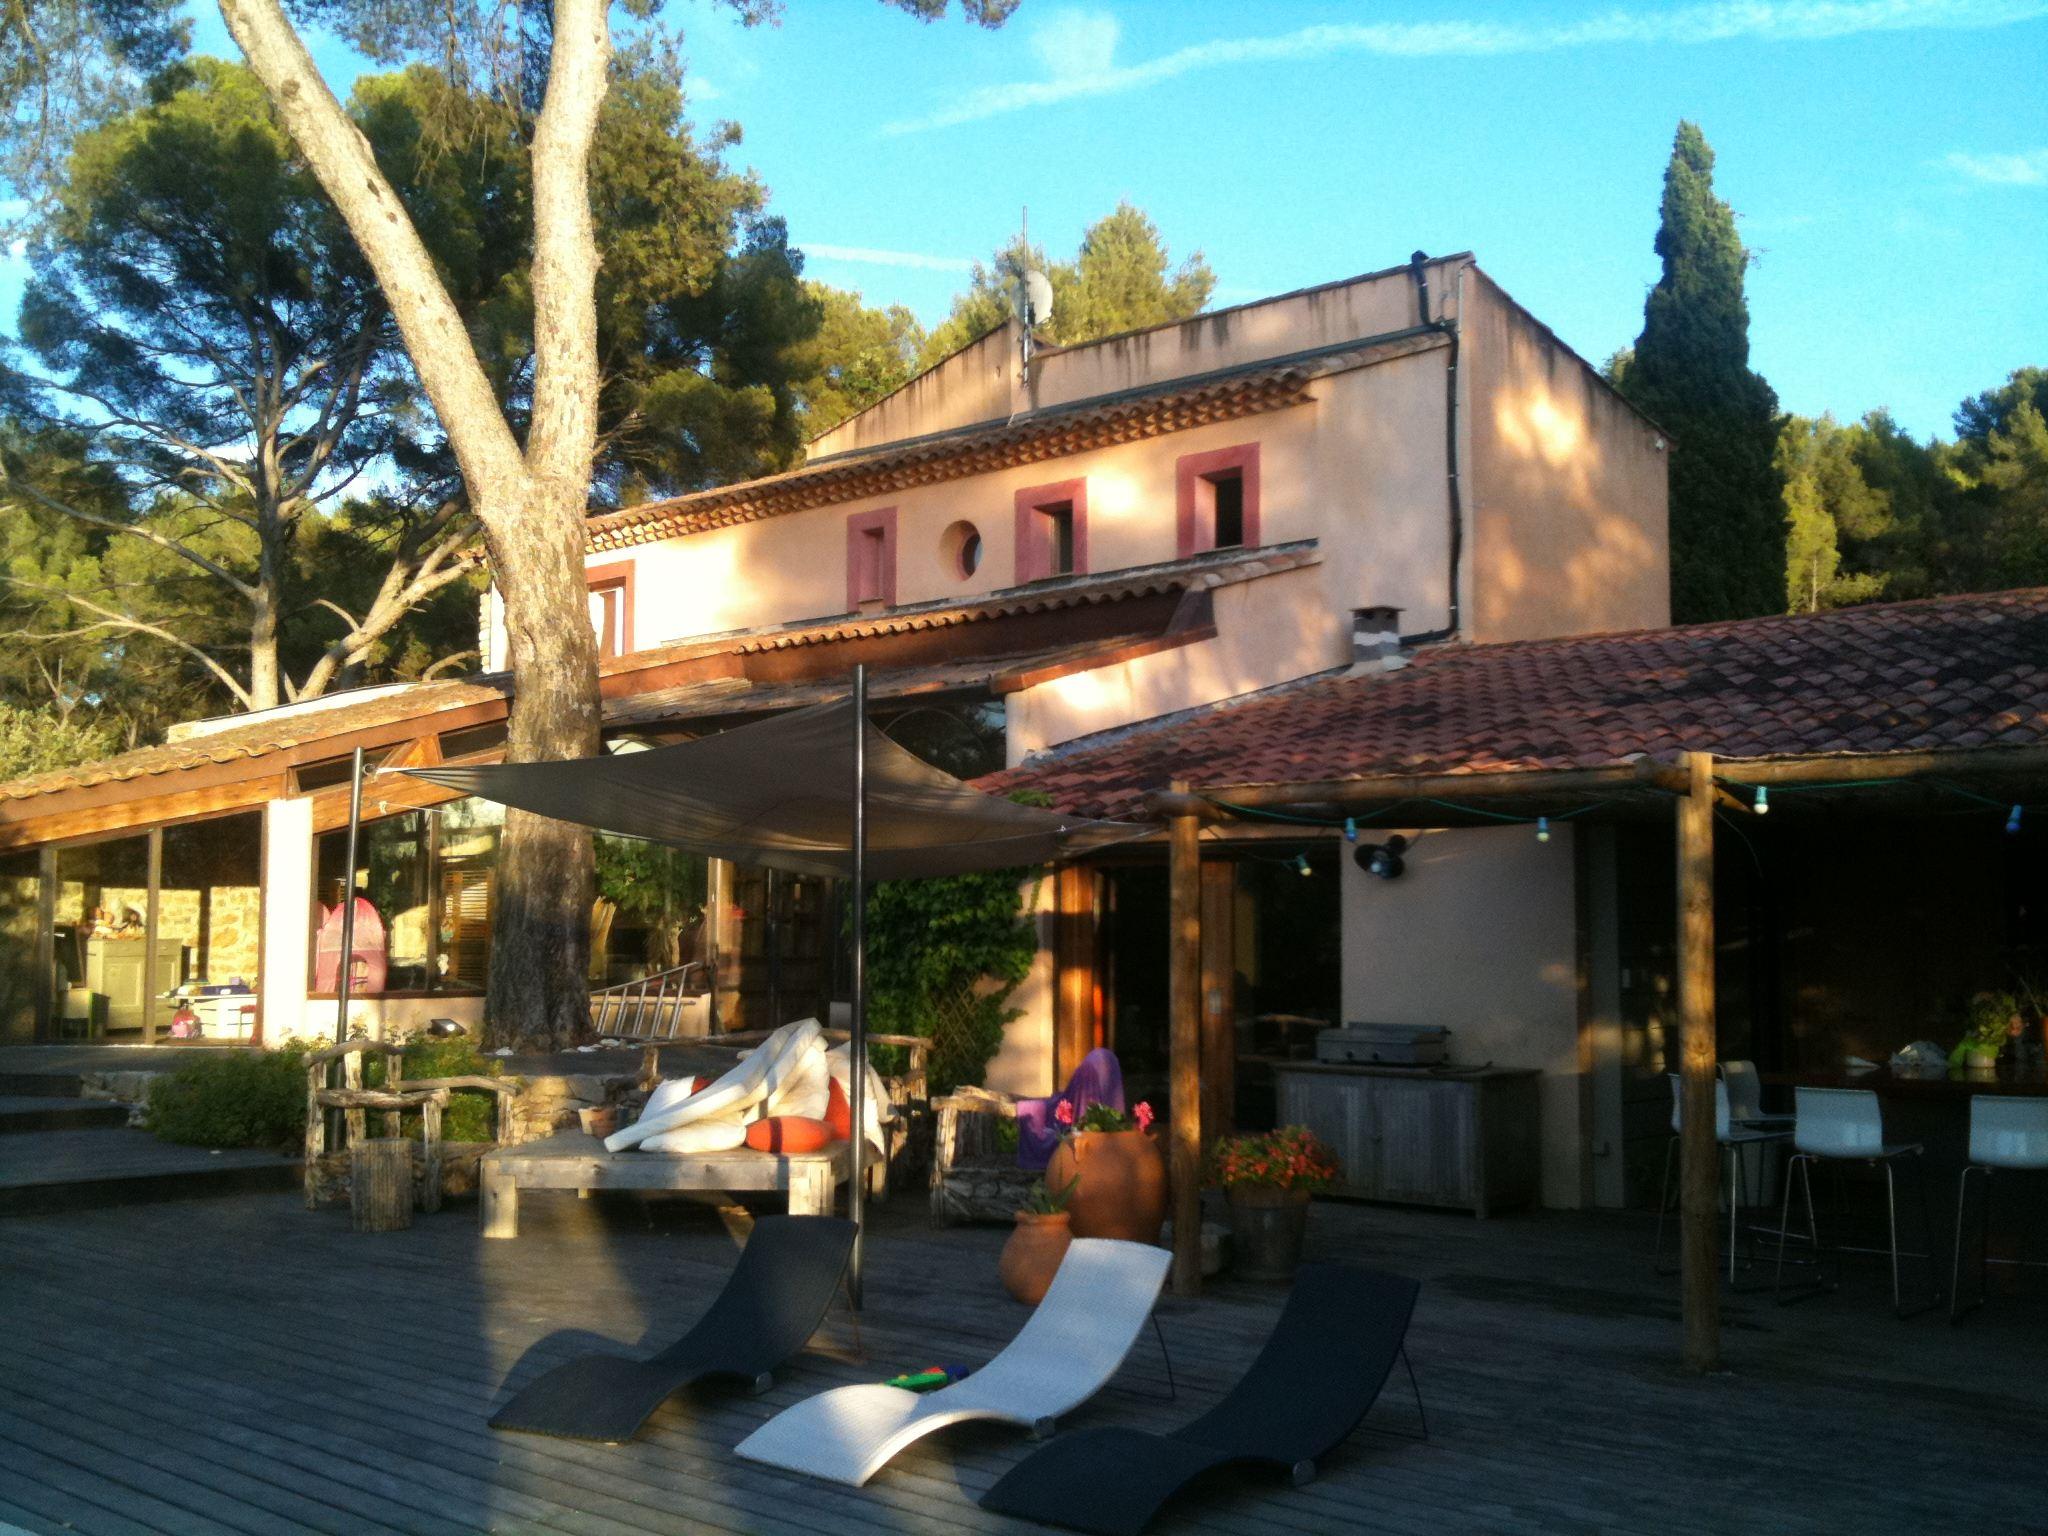 Moradia para Venda às AIX - PONT DES TROIS SAUTETS Other Provence-Alpes-Cote D'Azur, Provença-Alpes-Costa Azul, 13100 França